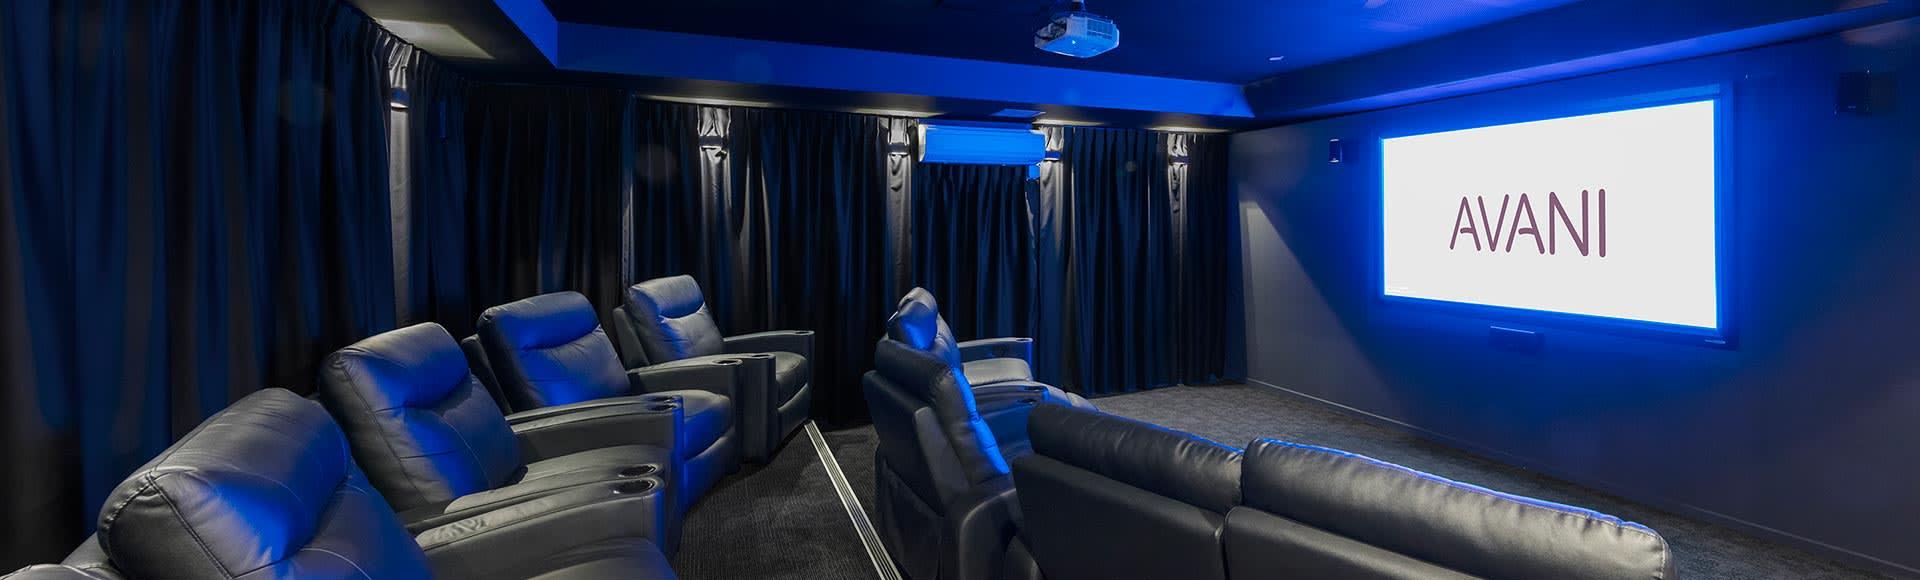 State-of-the-art screening room by Avani Adelaide